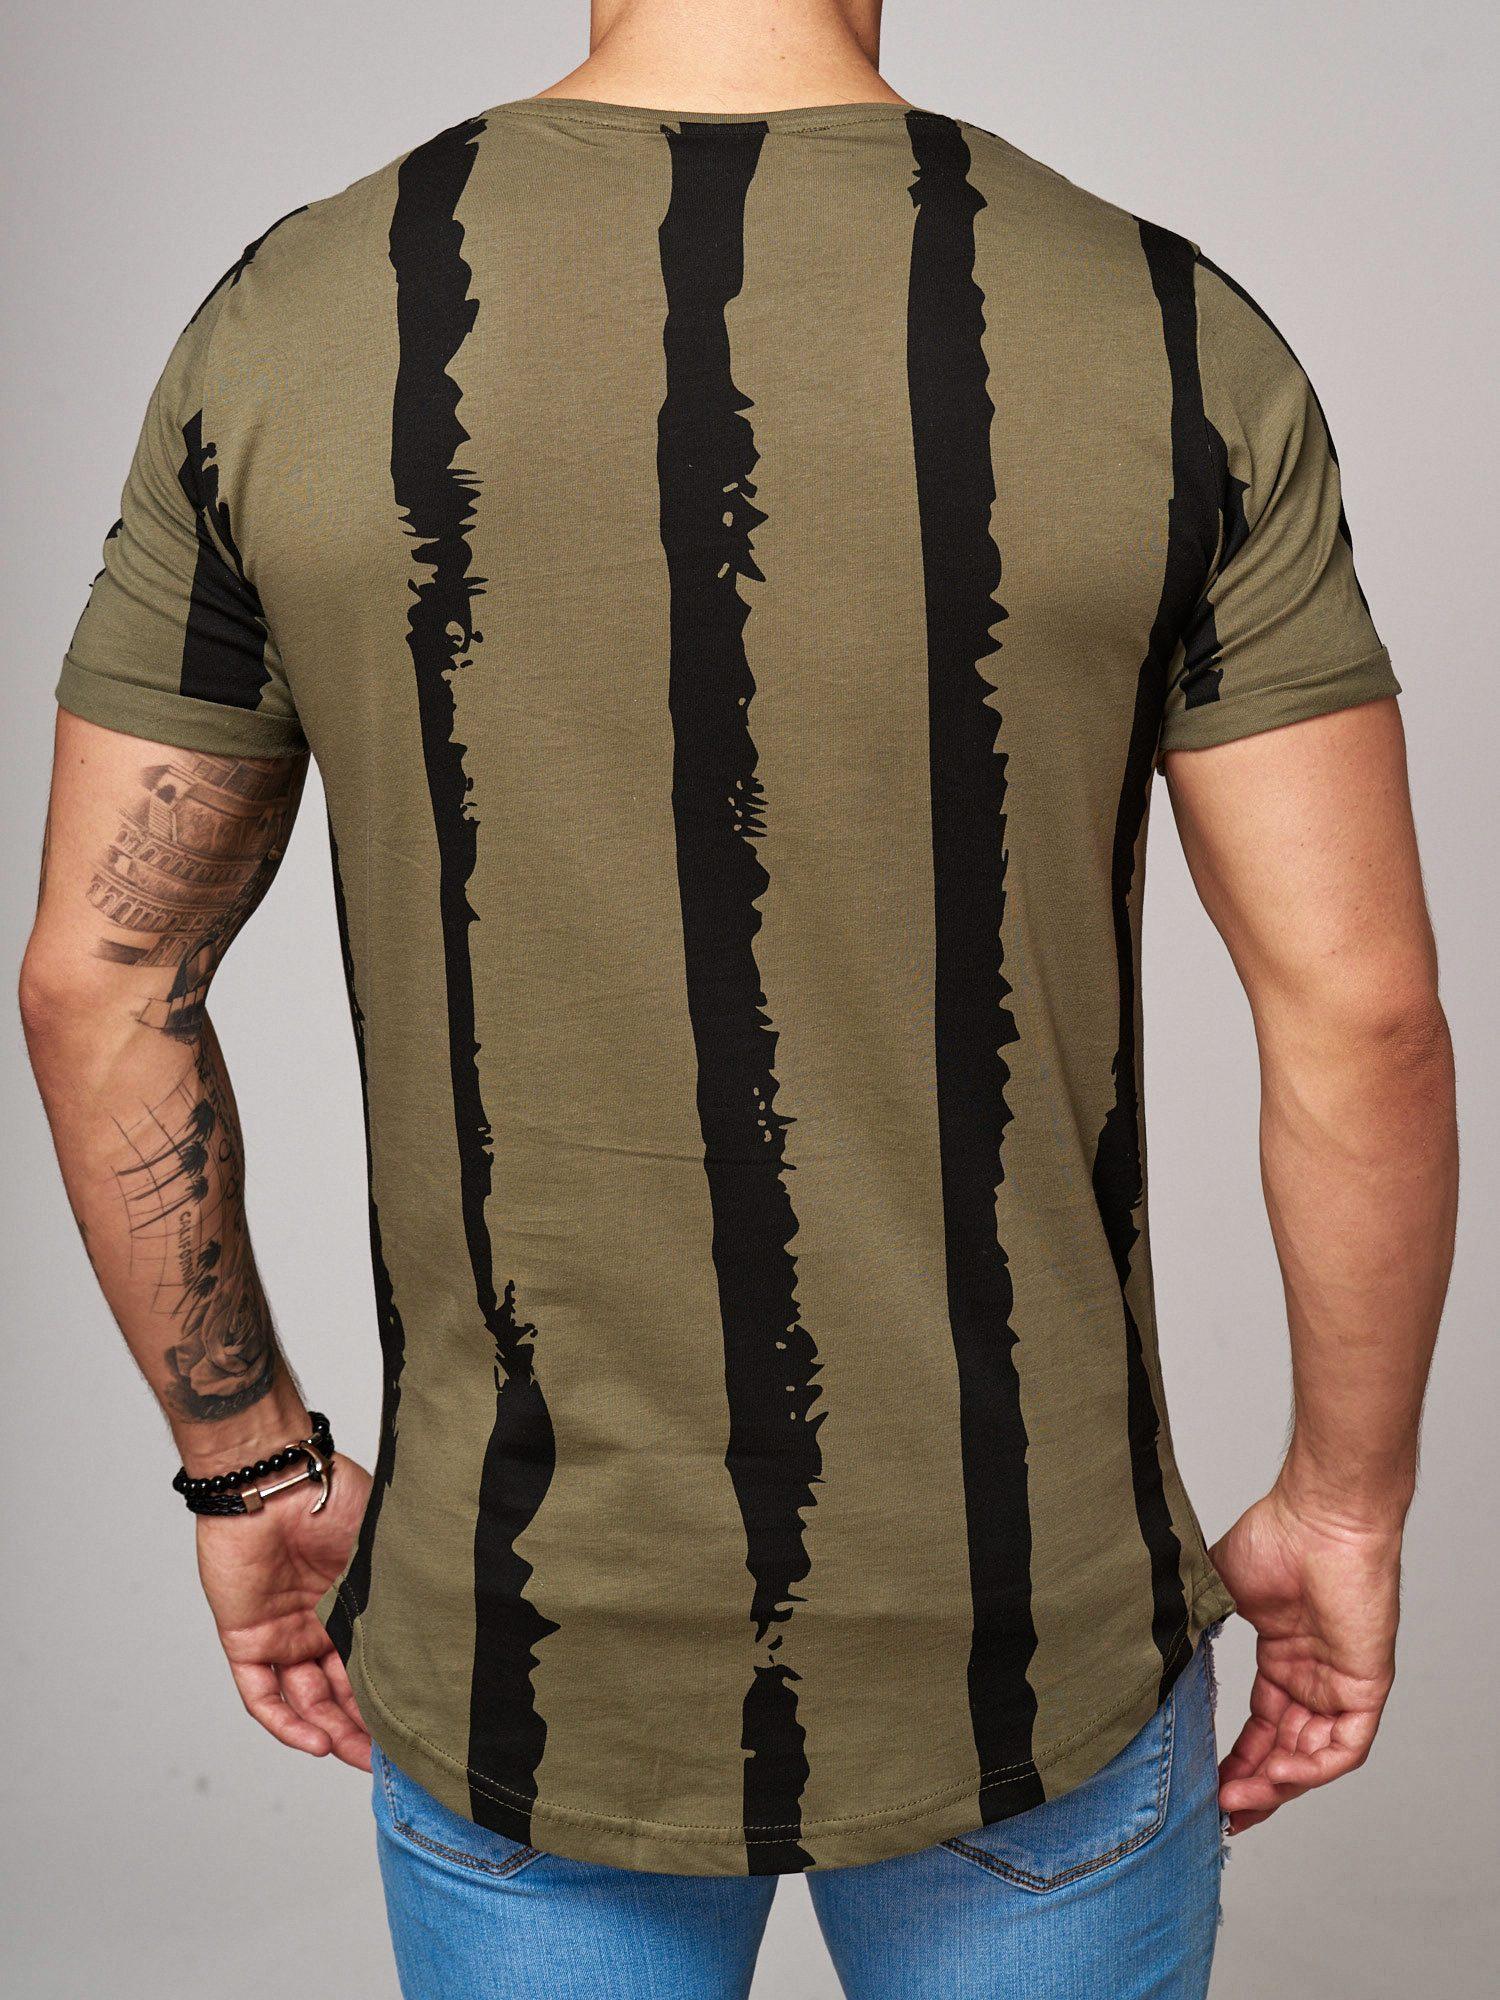 T-shirt-da-Uomo-Polo-Shirt-a-Maniche-Corte-printshirt-Polo-a-Maniche-Corte-17018-John-Kayna miniatura 21